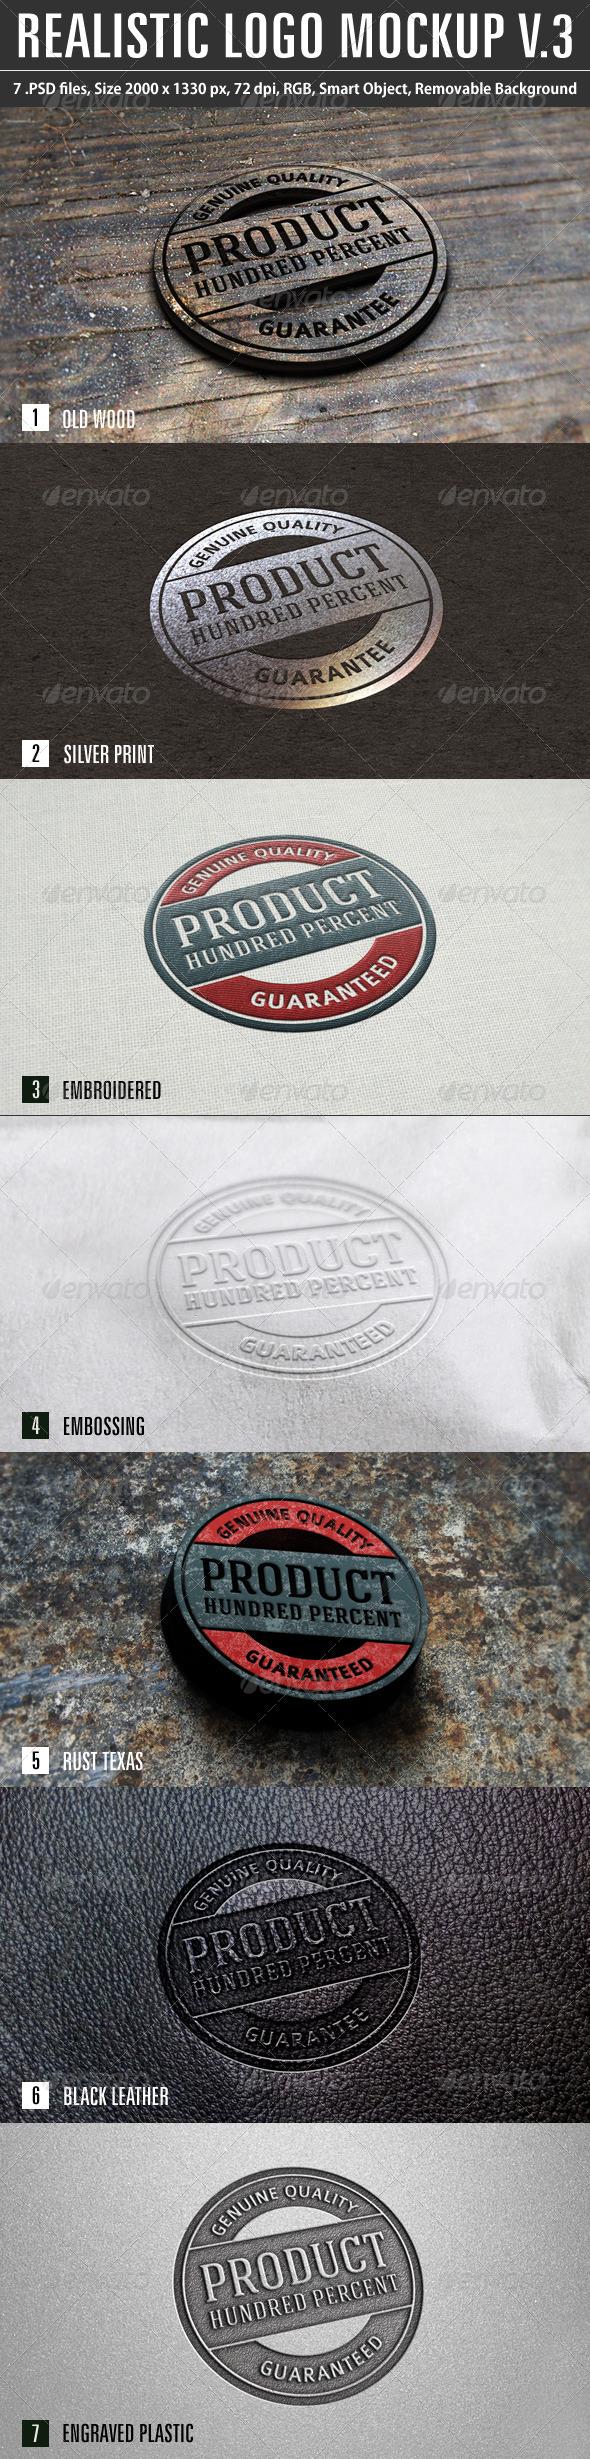 GraphicRiver Realistic Logo Mockup v.3 6949358